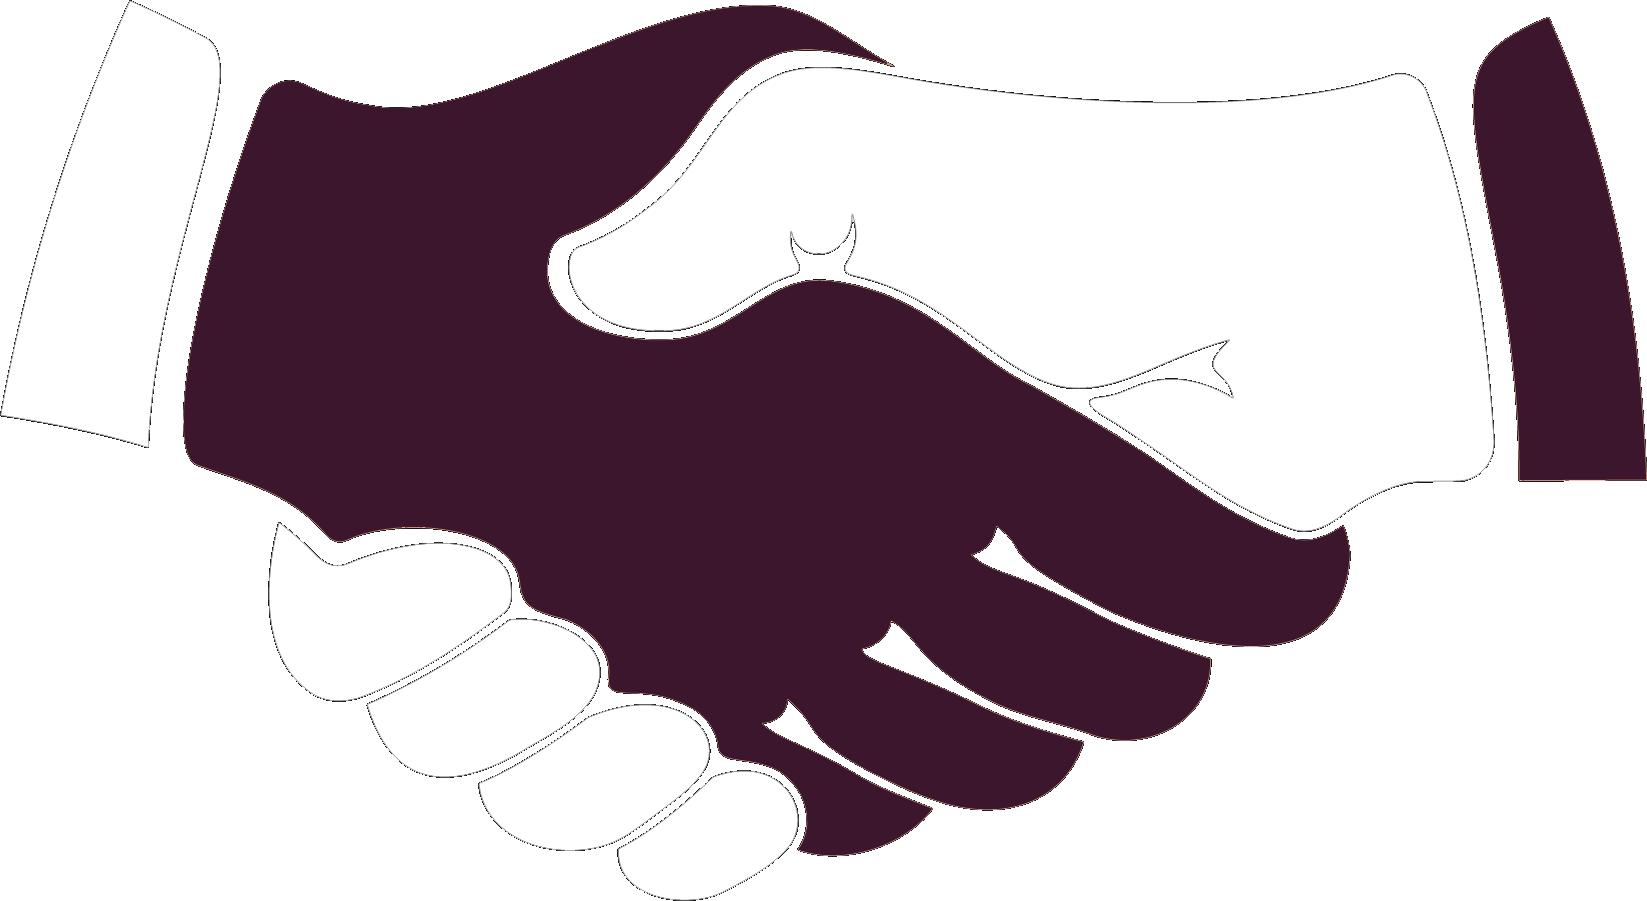 Roysons Handshake - Cooperation